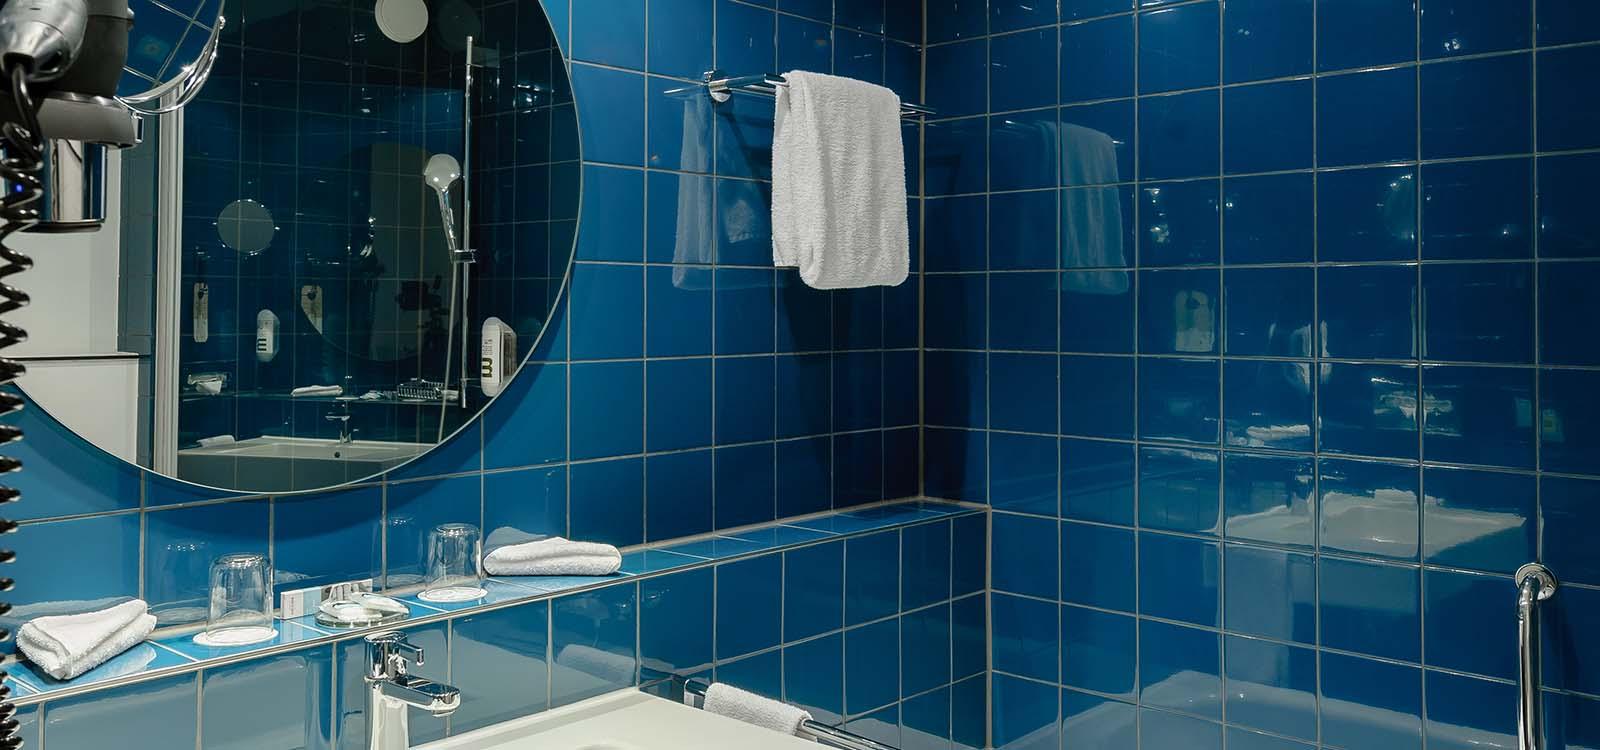 Badezimmer Mercure Nürnberg an der Messe - EVENT Hotels - Intl ...